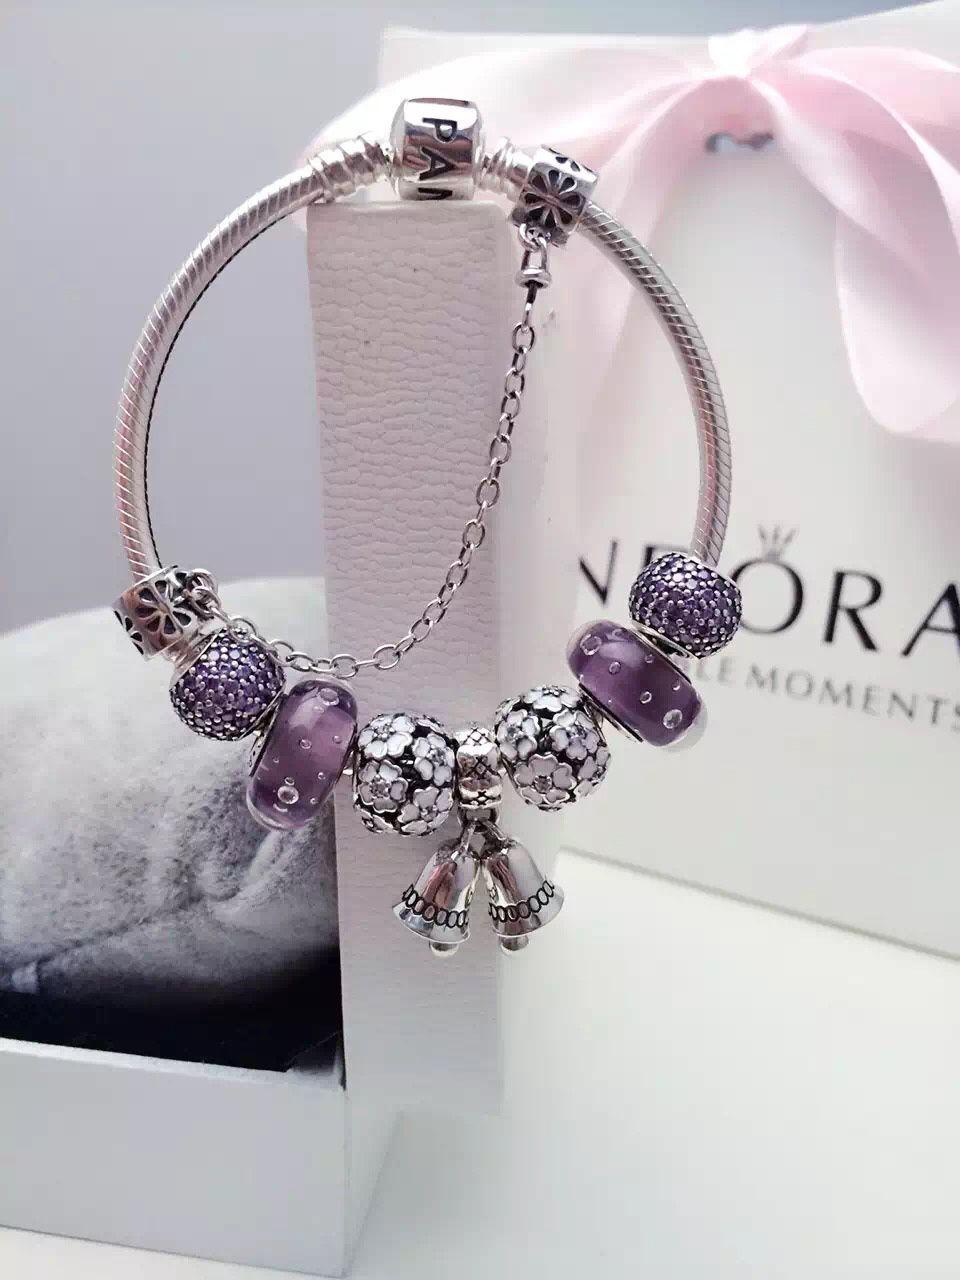 0b0a56fb2 $219 Pandora Charm Bracelet Purple White. Hot Sale!!! SKU: CB01886 - PANDORA  Bracelet Ideas